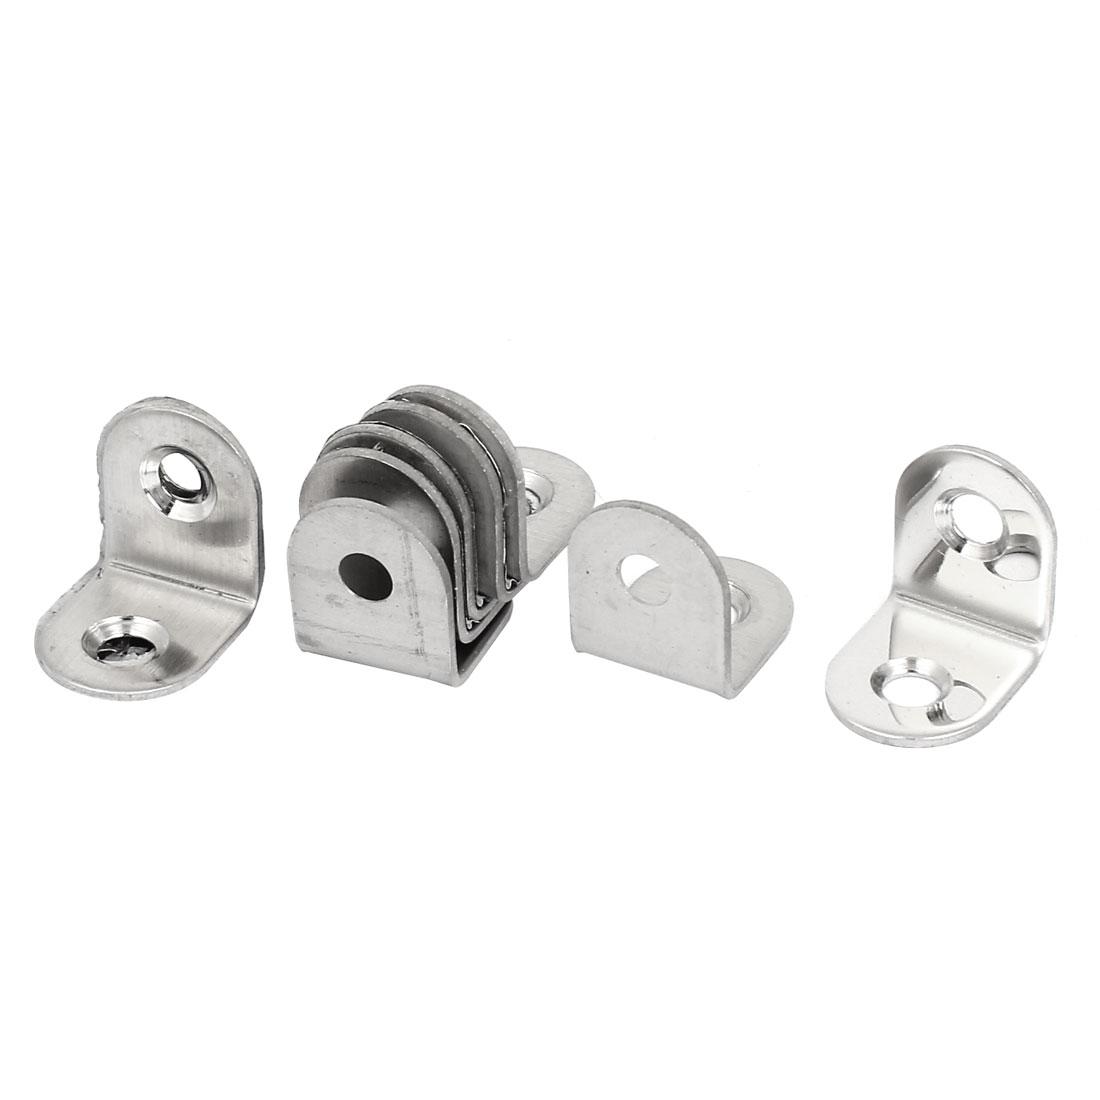 10 Pcs 20mmx20mmx16mm Round End Corner Brace Angle Repair Brackets Fasteners